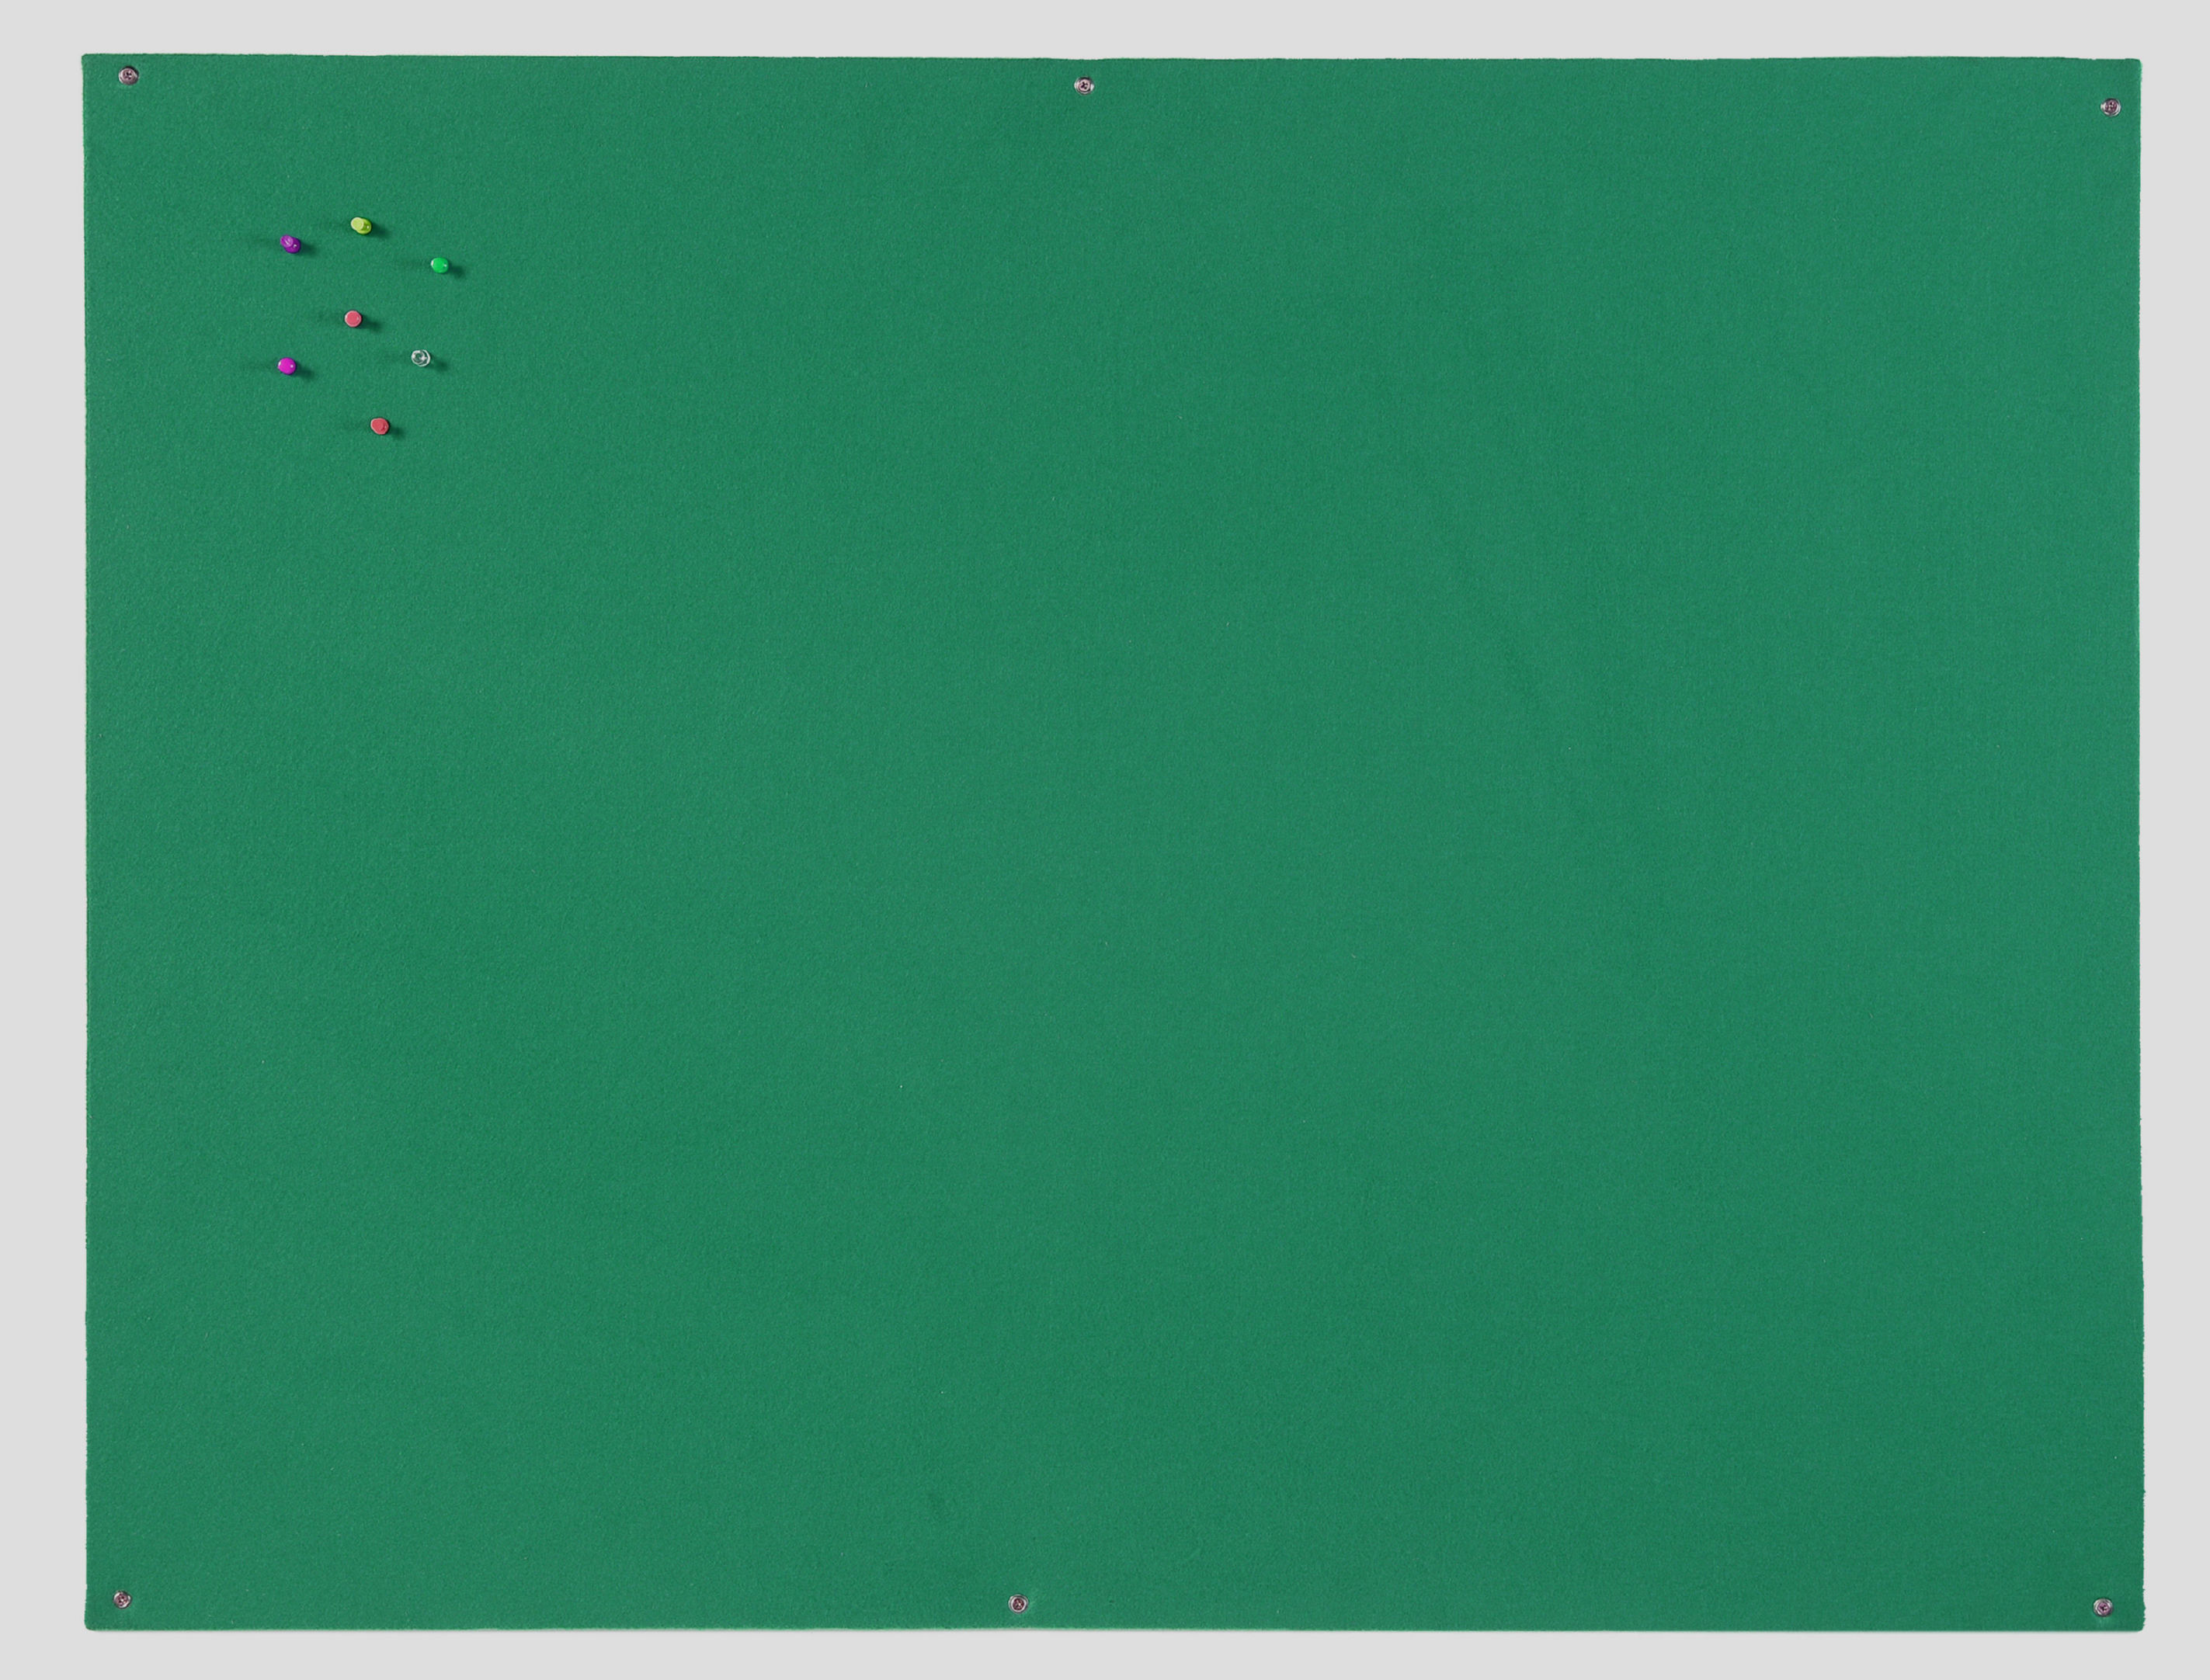 Felt Bi-Office Green Felt Noticeboard Unframed 900x600mm